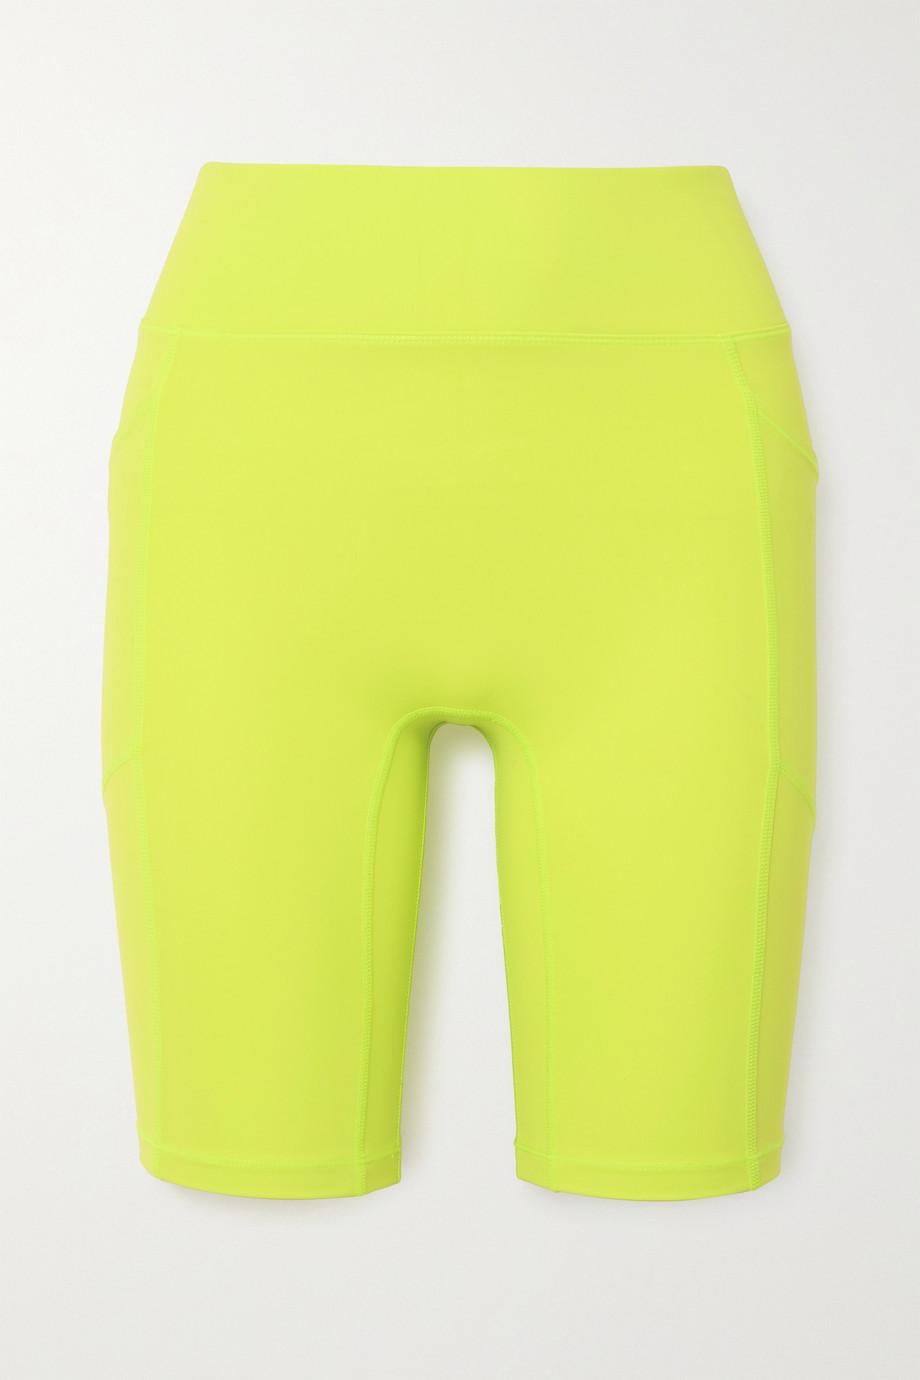 All Access Record Breaker stretch biker shorts